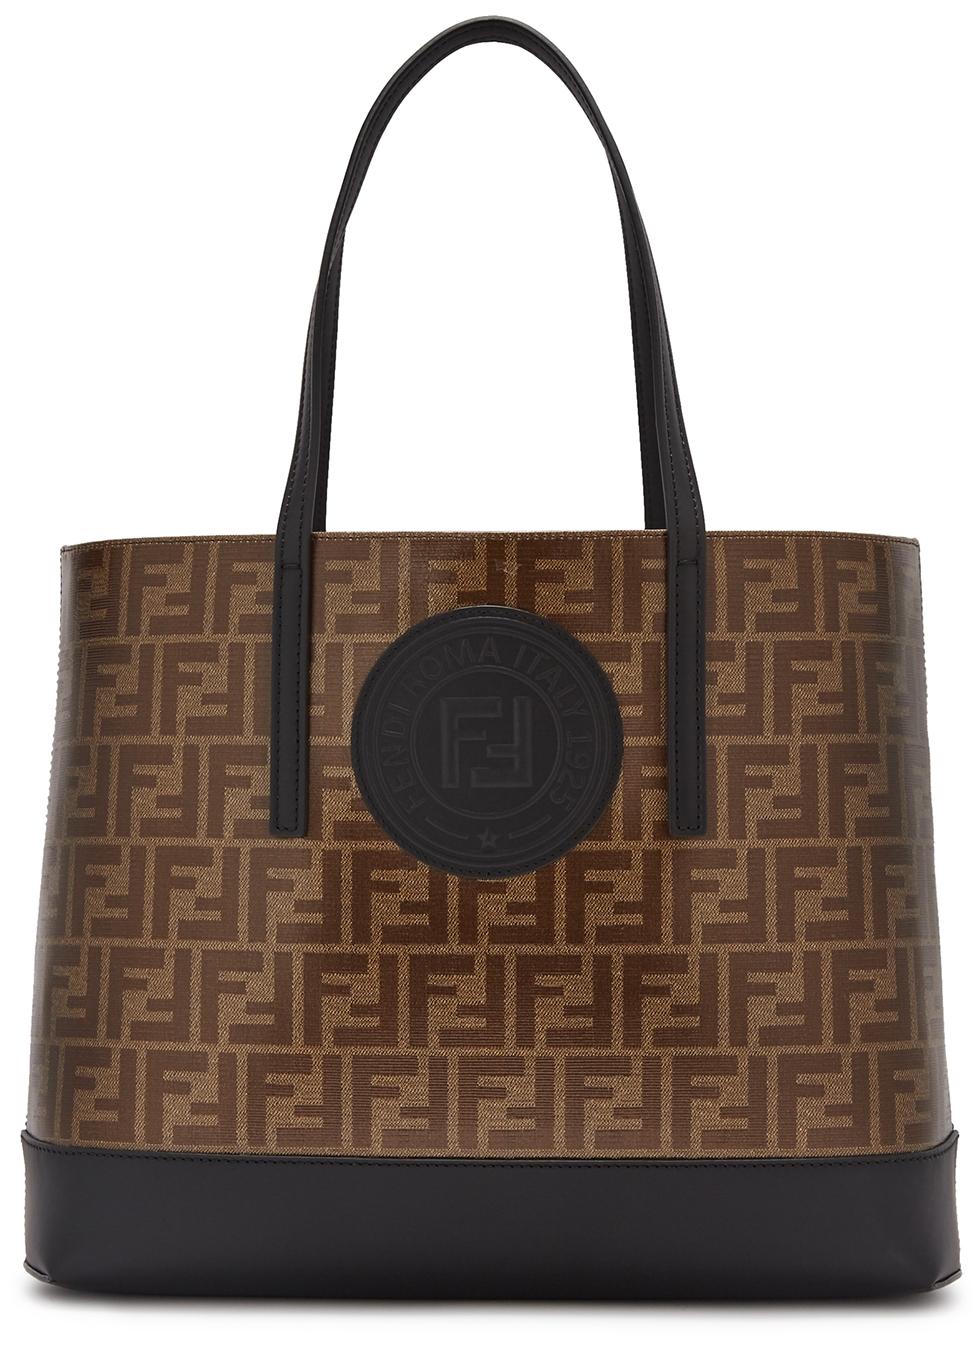 Brown monogrammed leather tote - Fendi